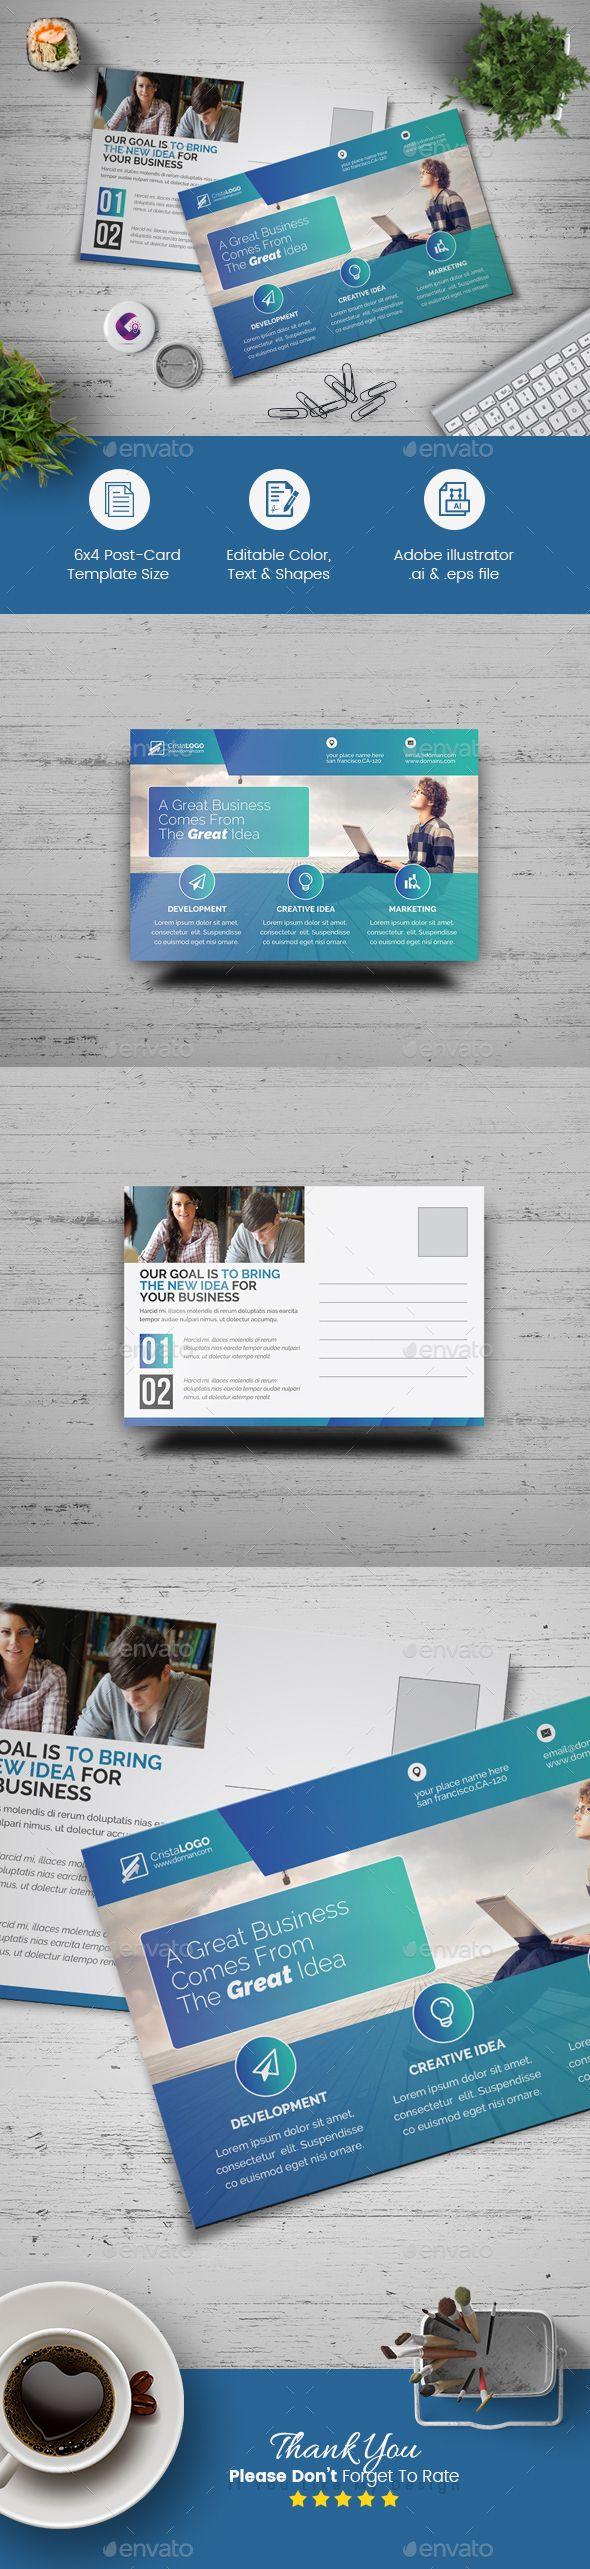 Postcard Template Cards Invites Pinterest Postcard Template